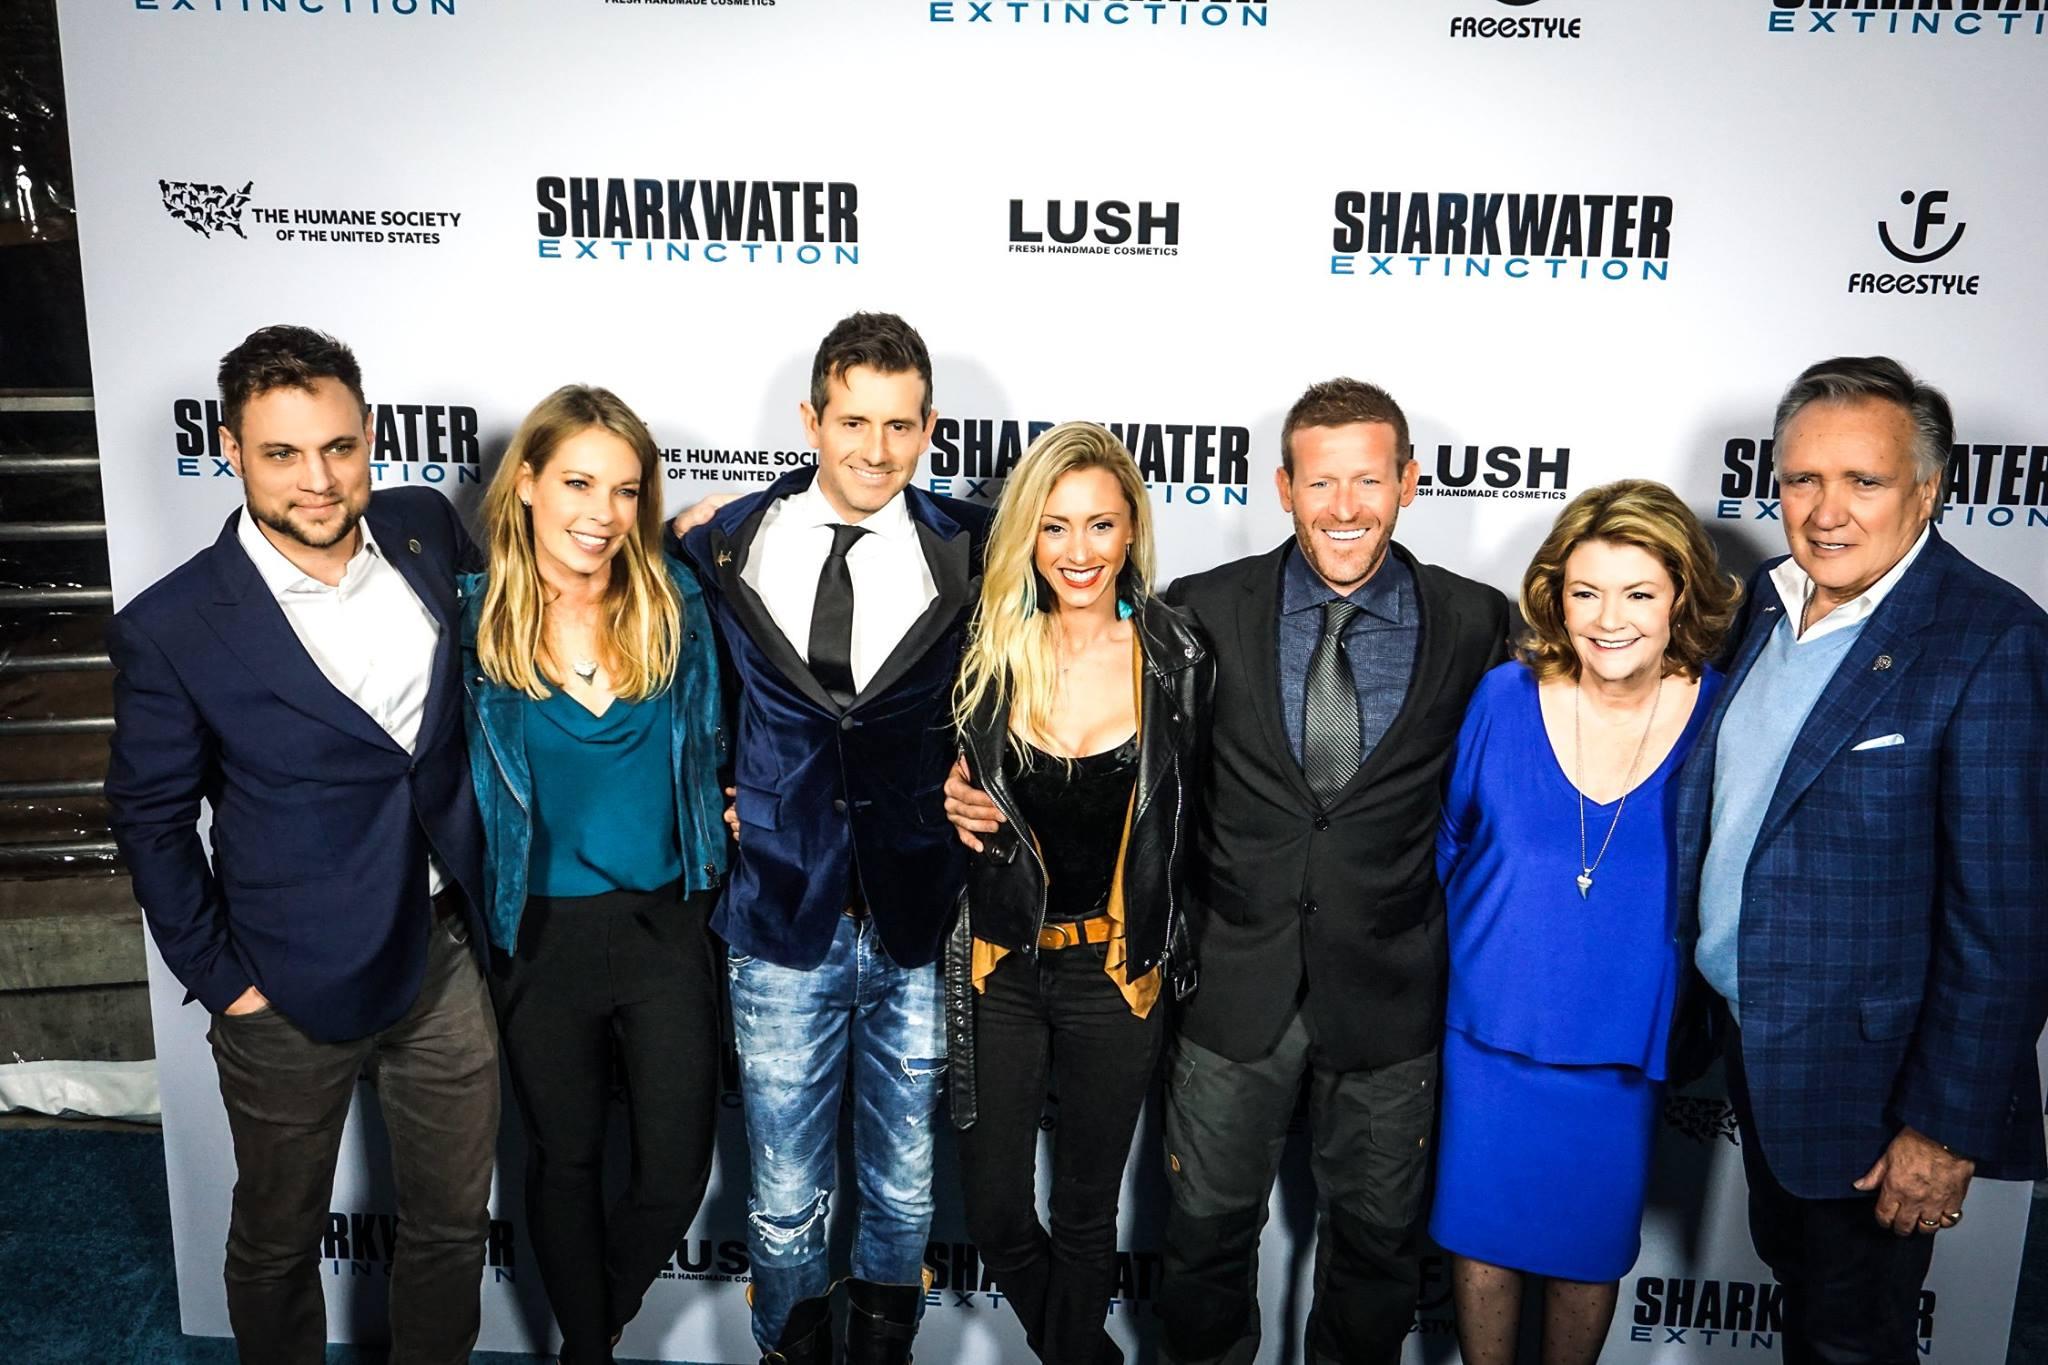 'Sharkwater Extinction' U.S. Premiere